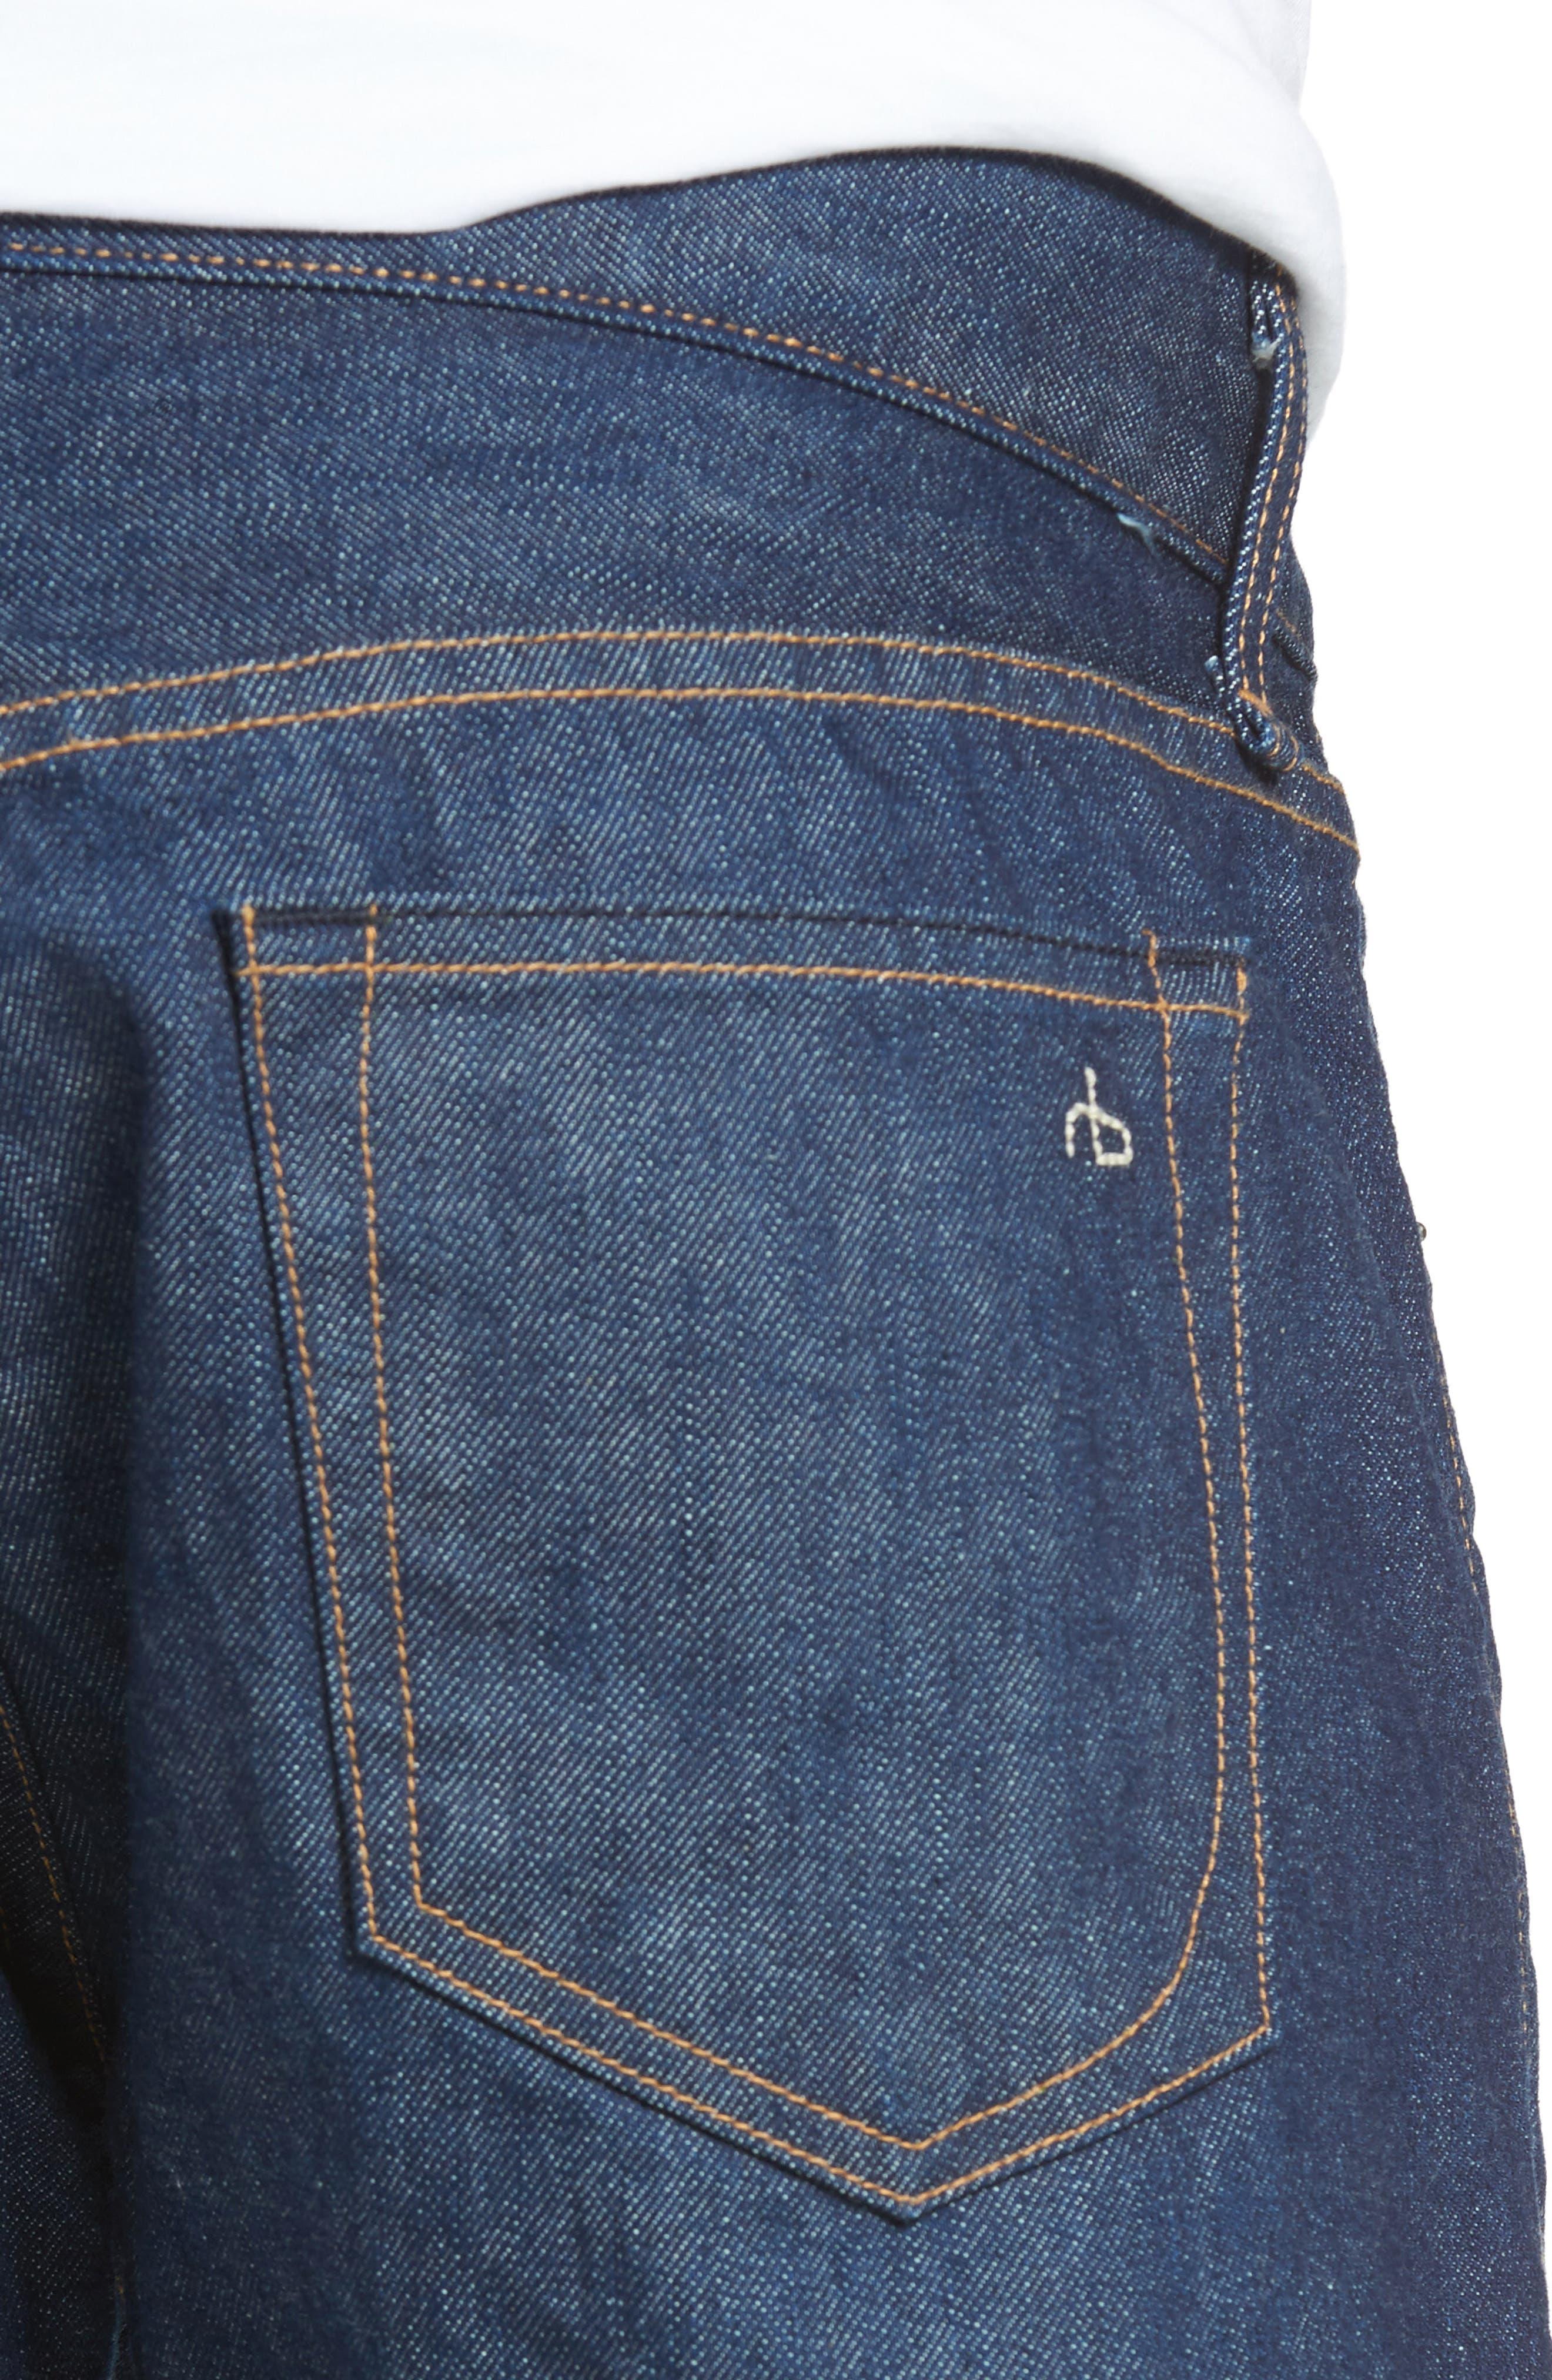 Fit 2 Slim Fit Selvedge Jeans,                             Alternate thumbnail 4, color,                             427